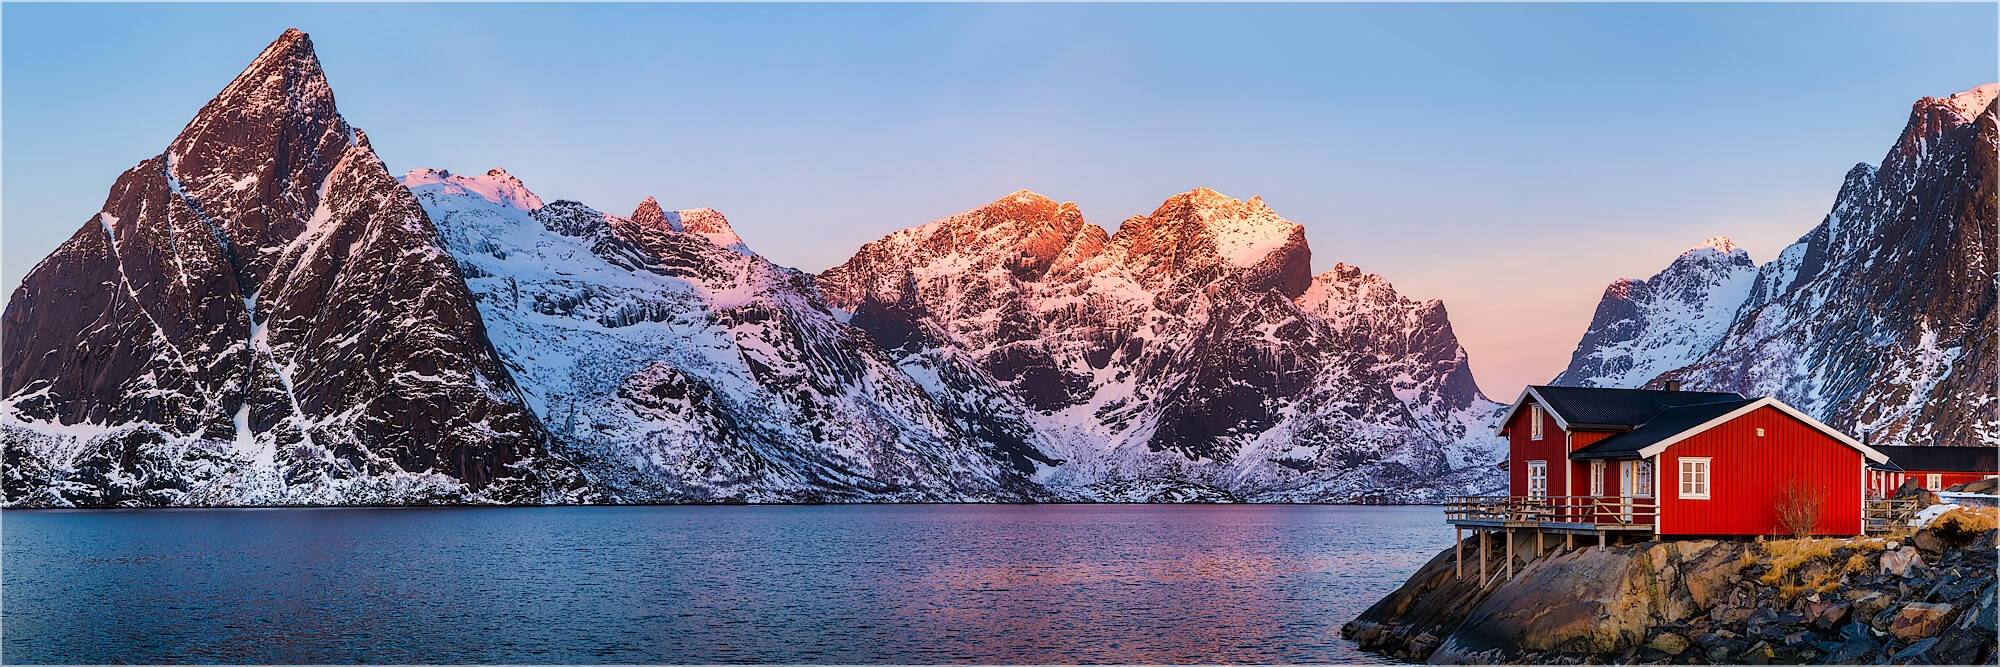 Panoramafoto Robuer Hütte am Fjord Lofoten Norwegen